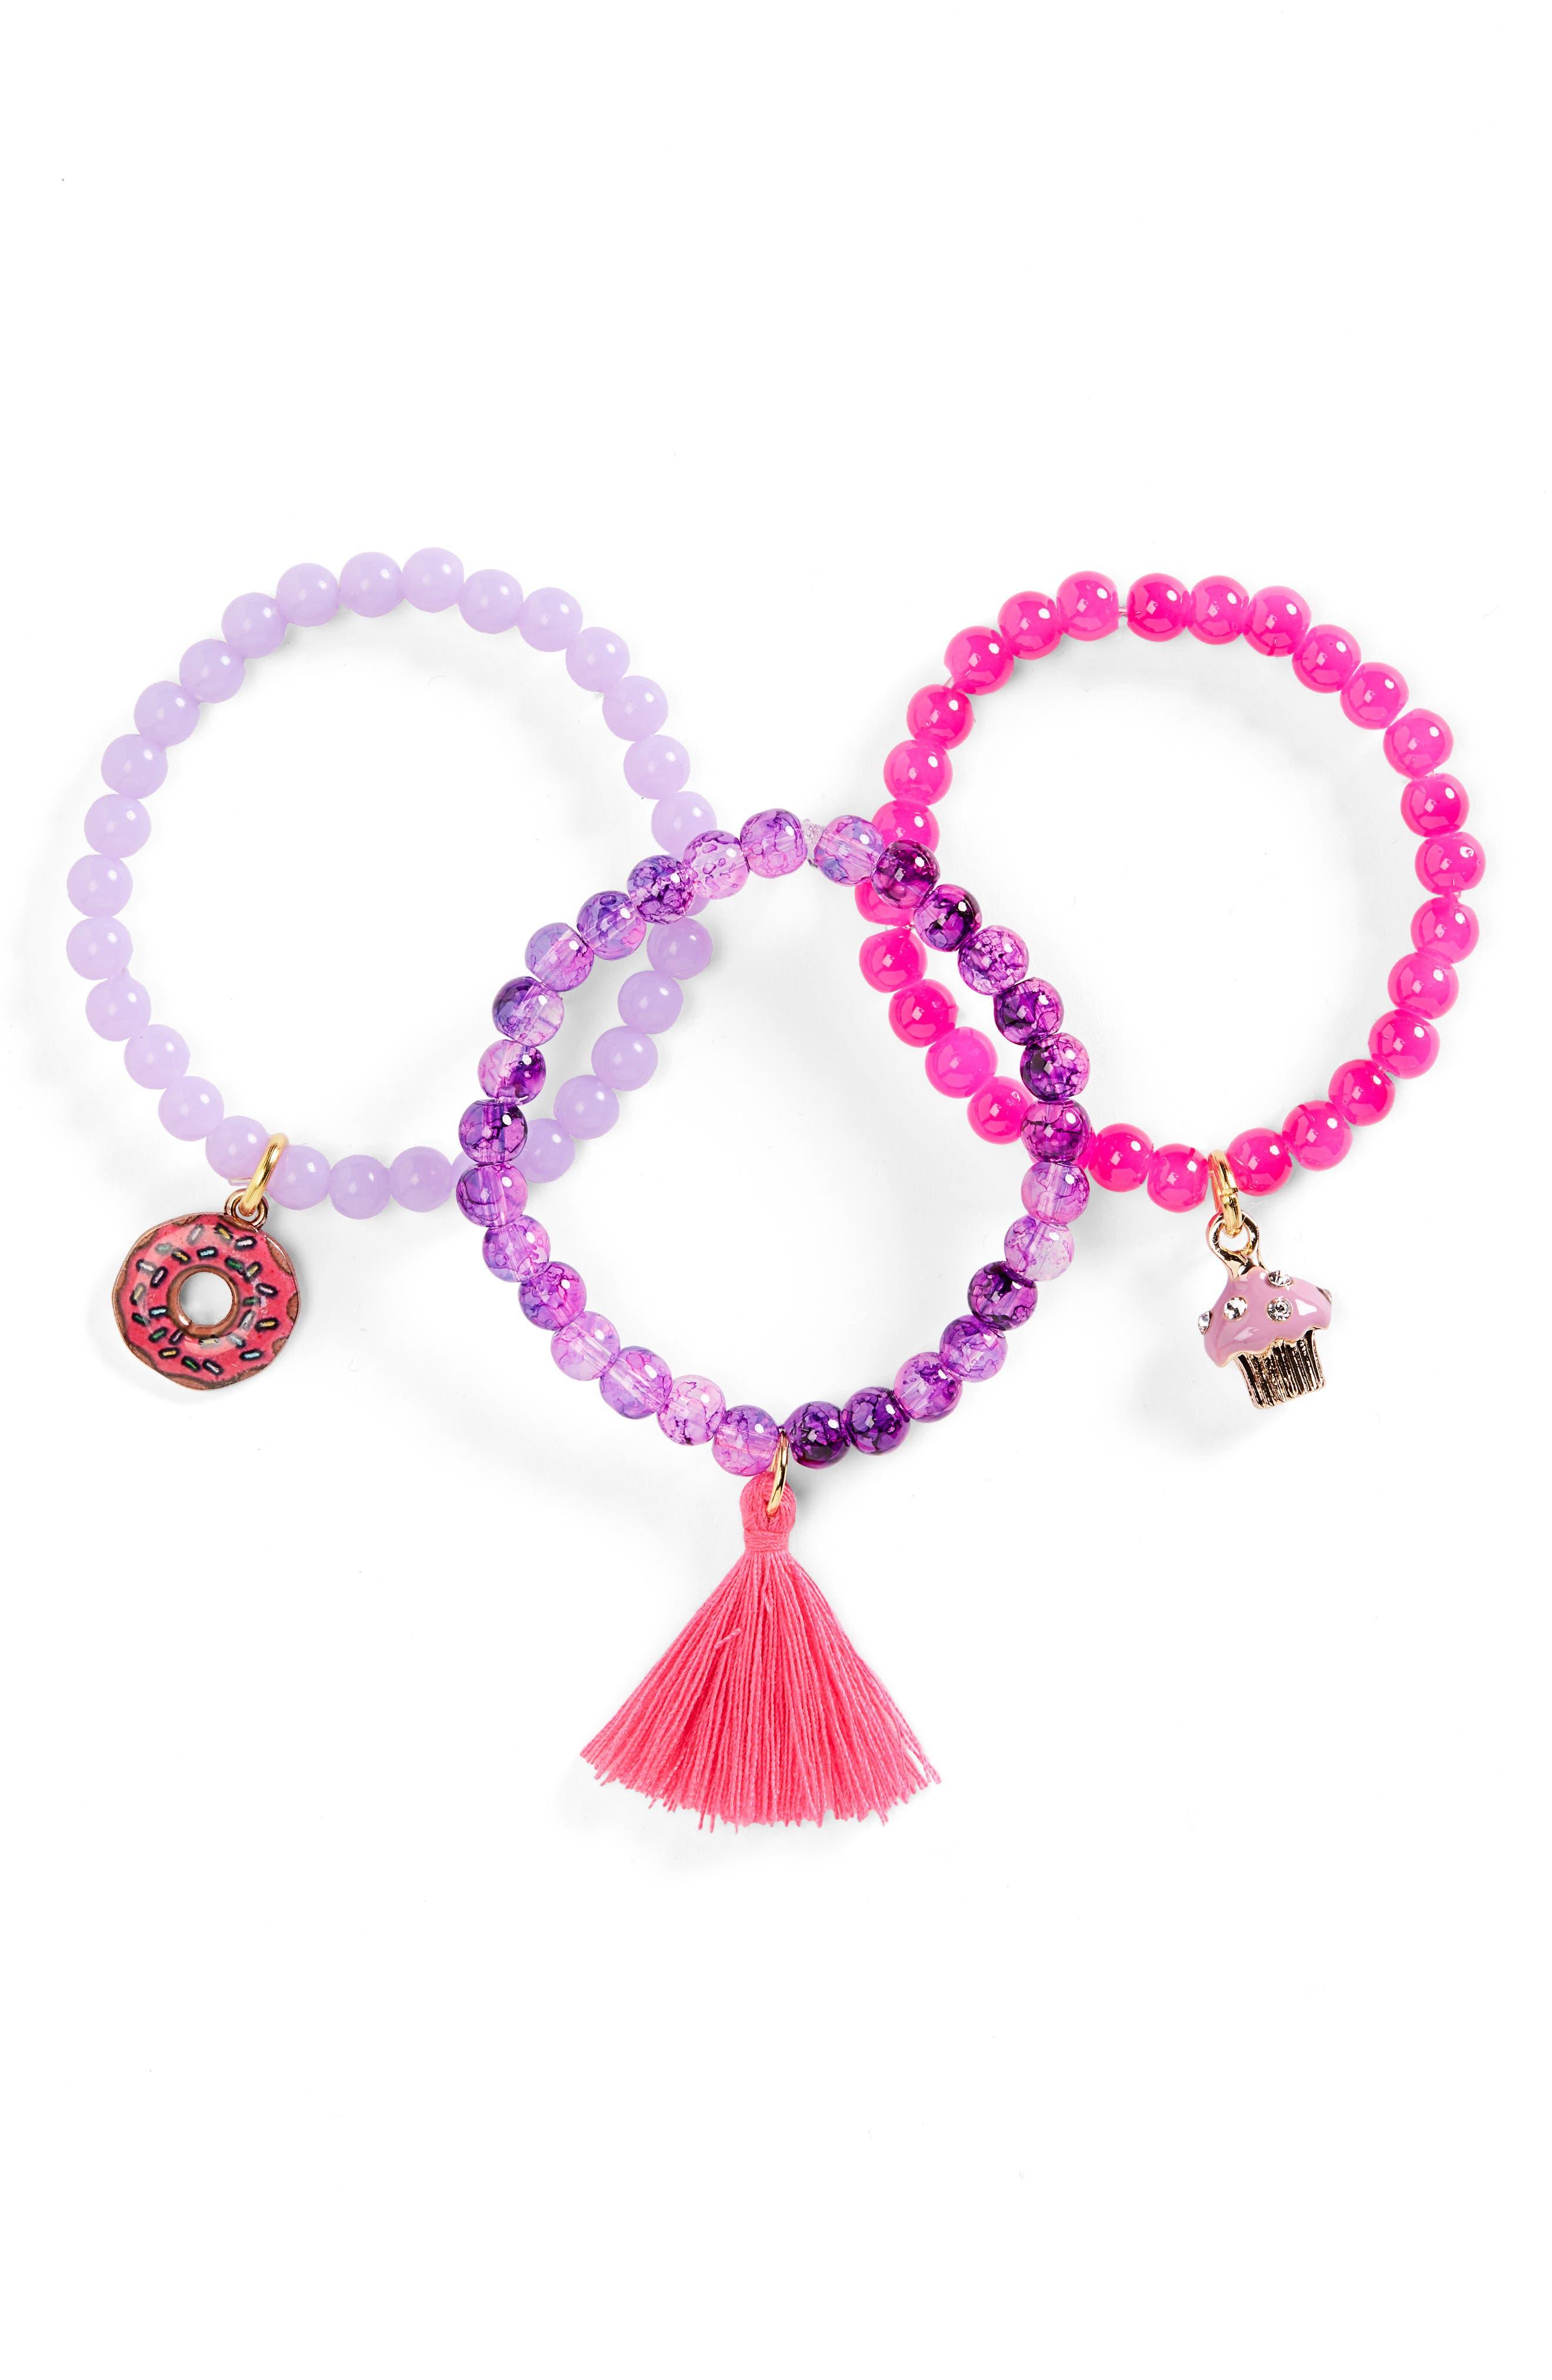 Set of 3 Beaded Stretch Bracelets,                         Main,                         color, PURPLE